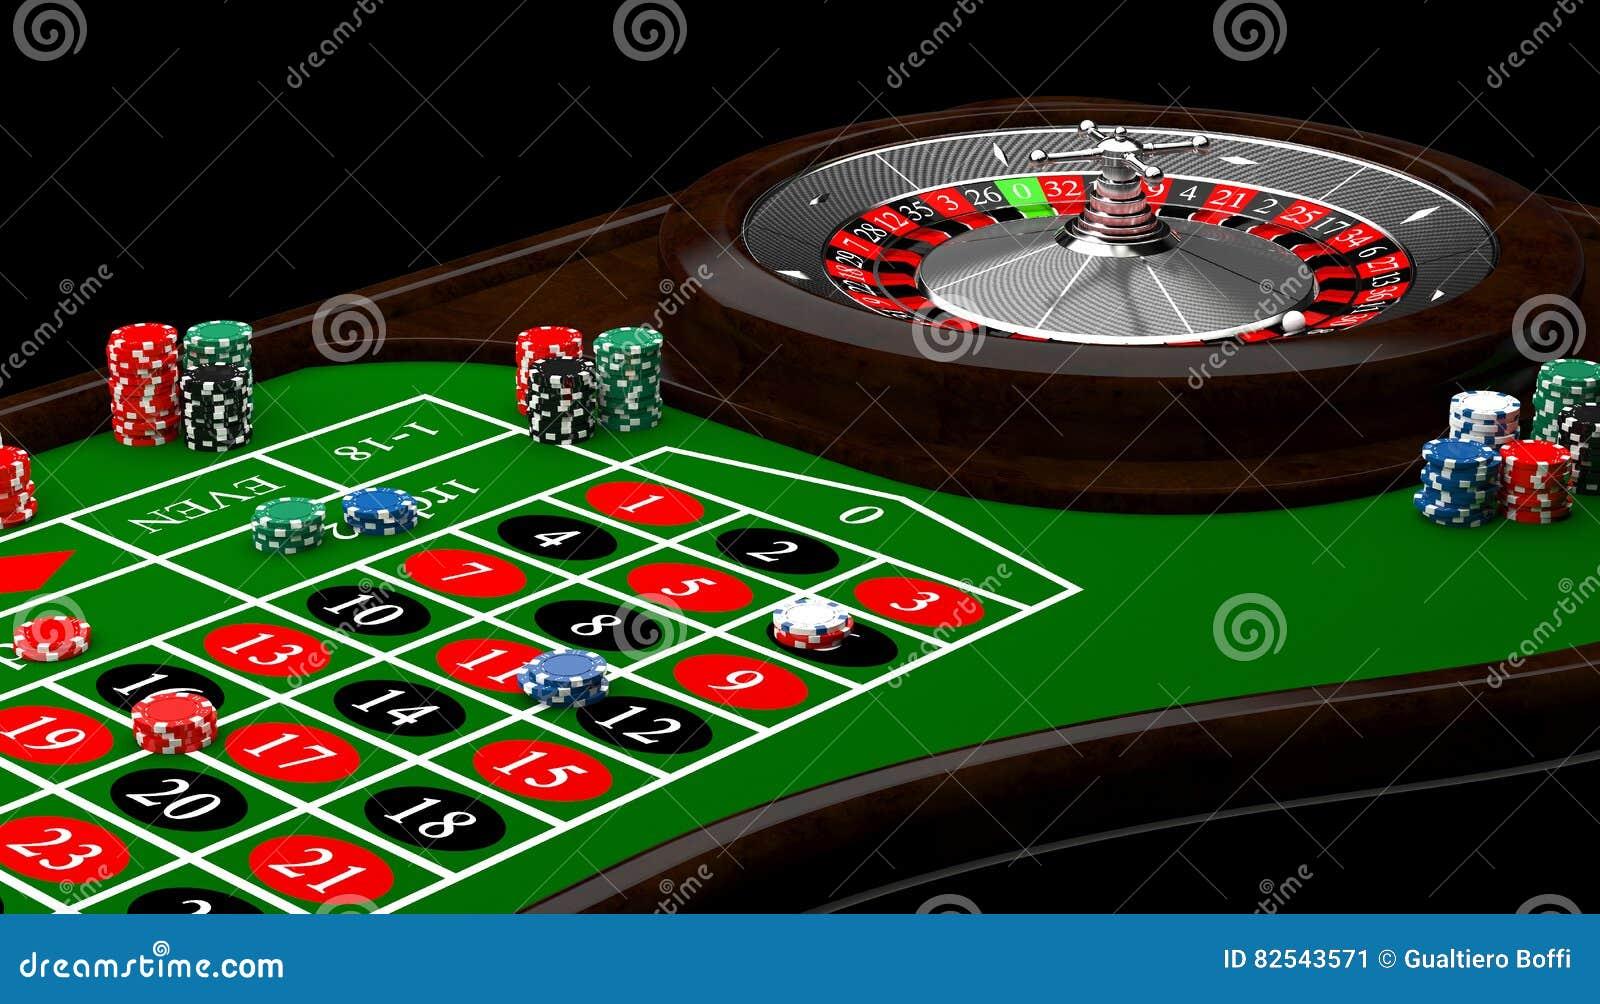 casino online roulette casino holidays